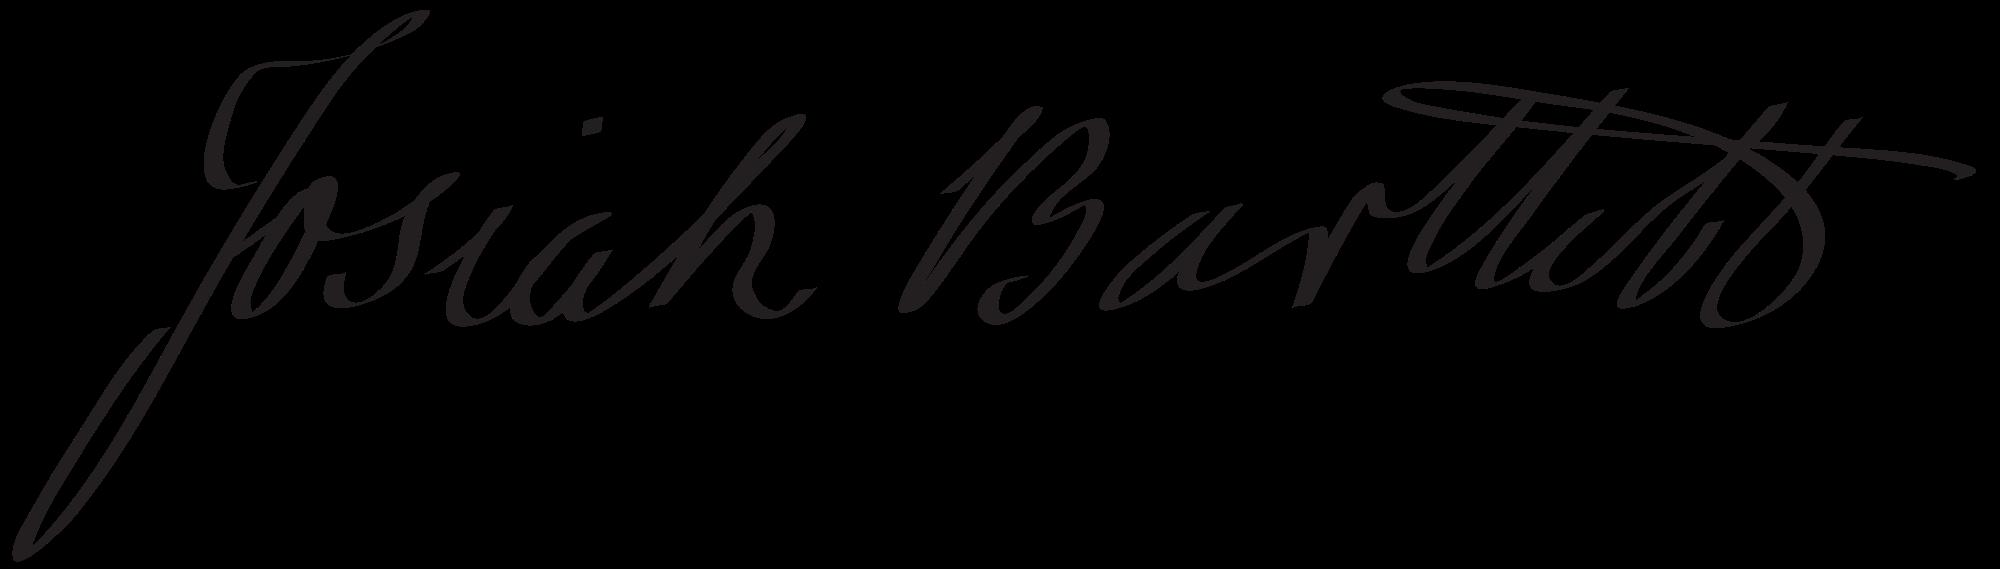 2000px-Josiah_Bartlett_Signature.svg